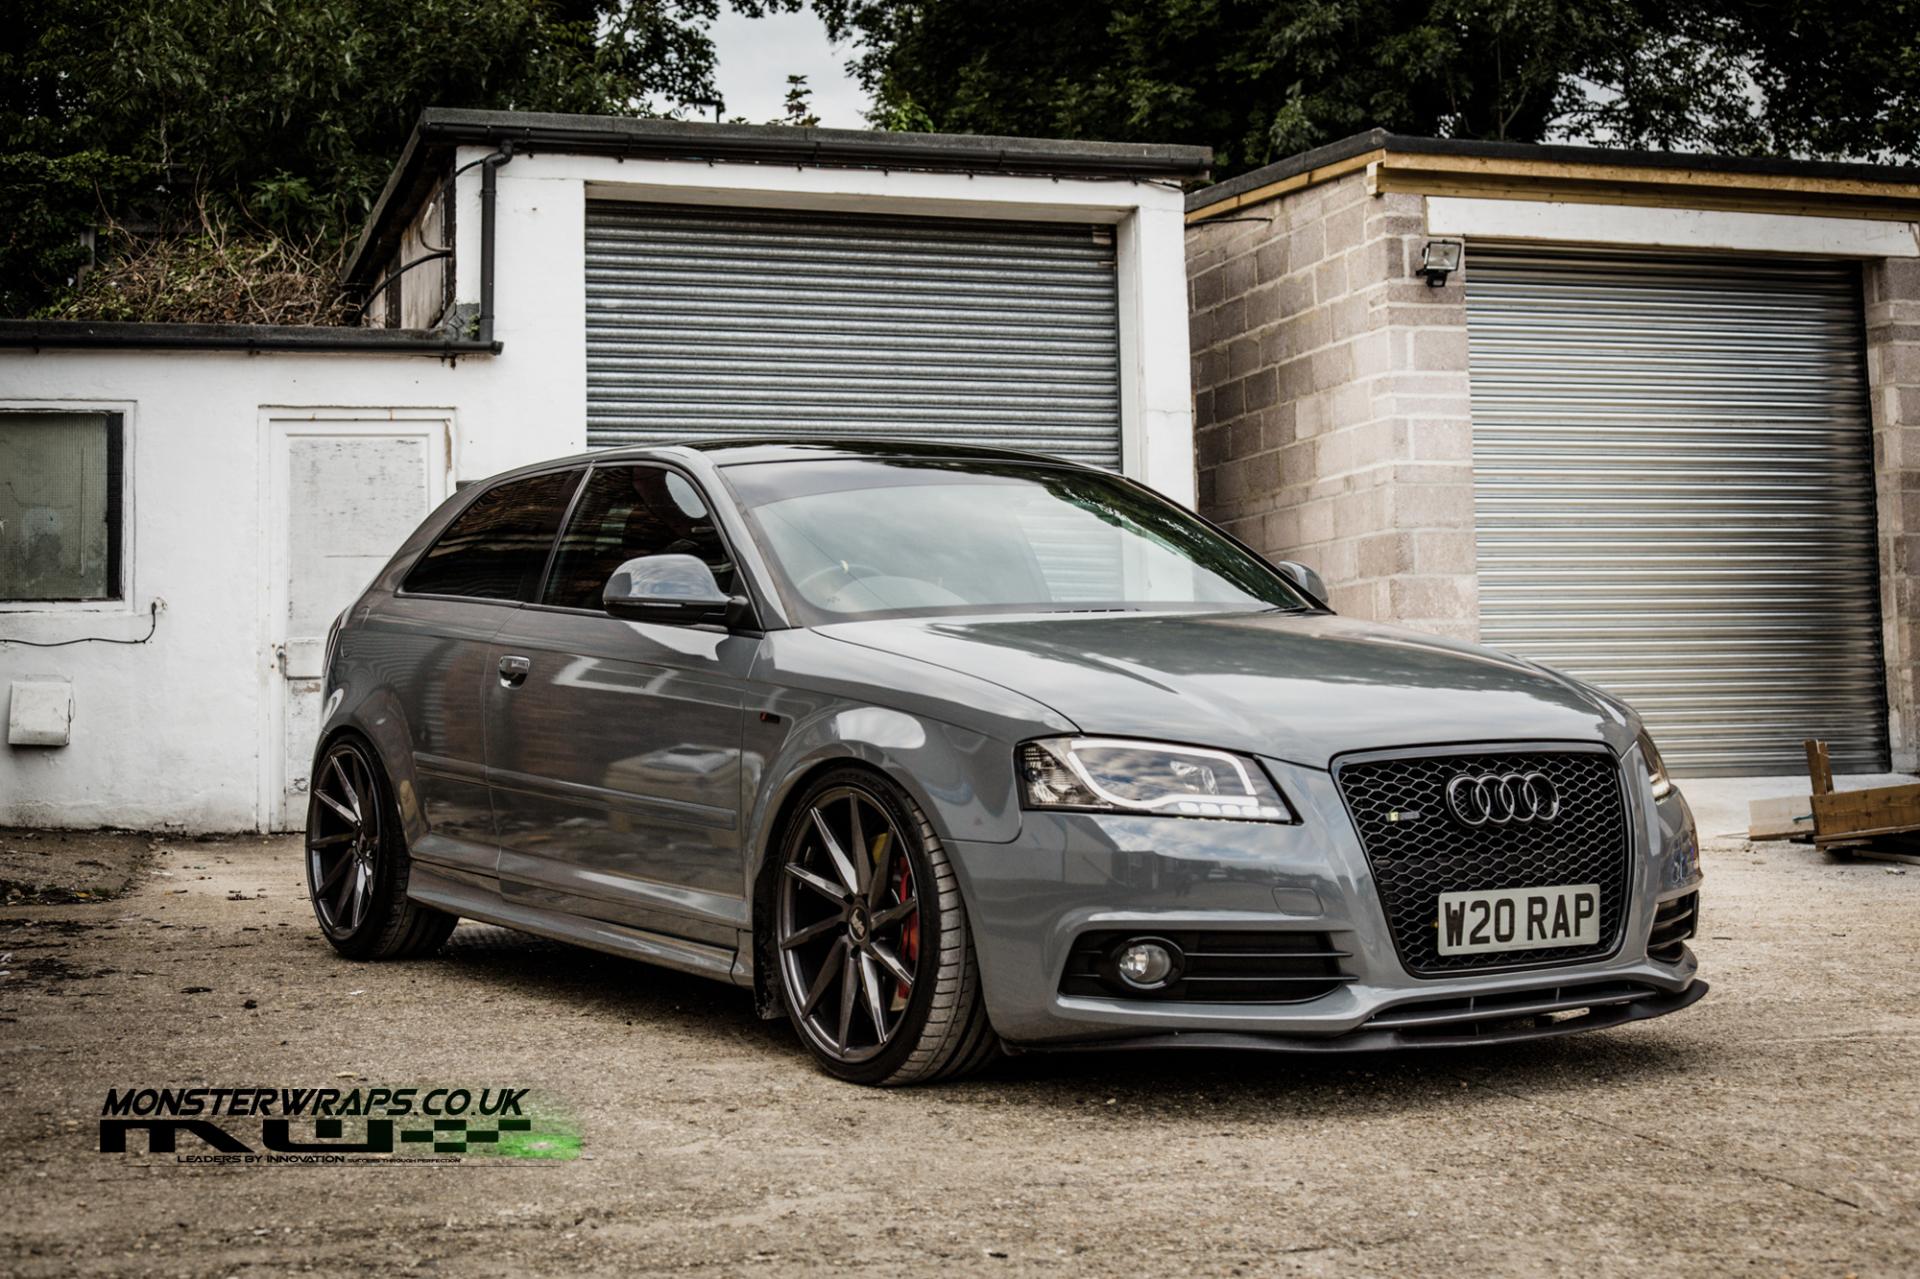 Audi A3 Gloss dark grey wrap